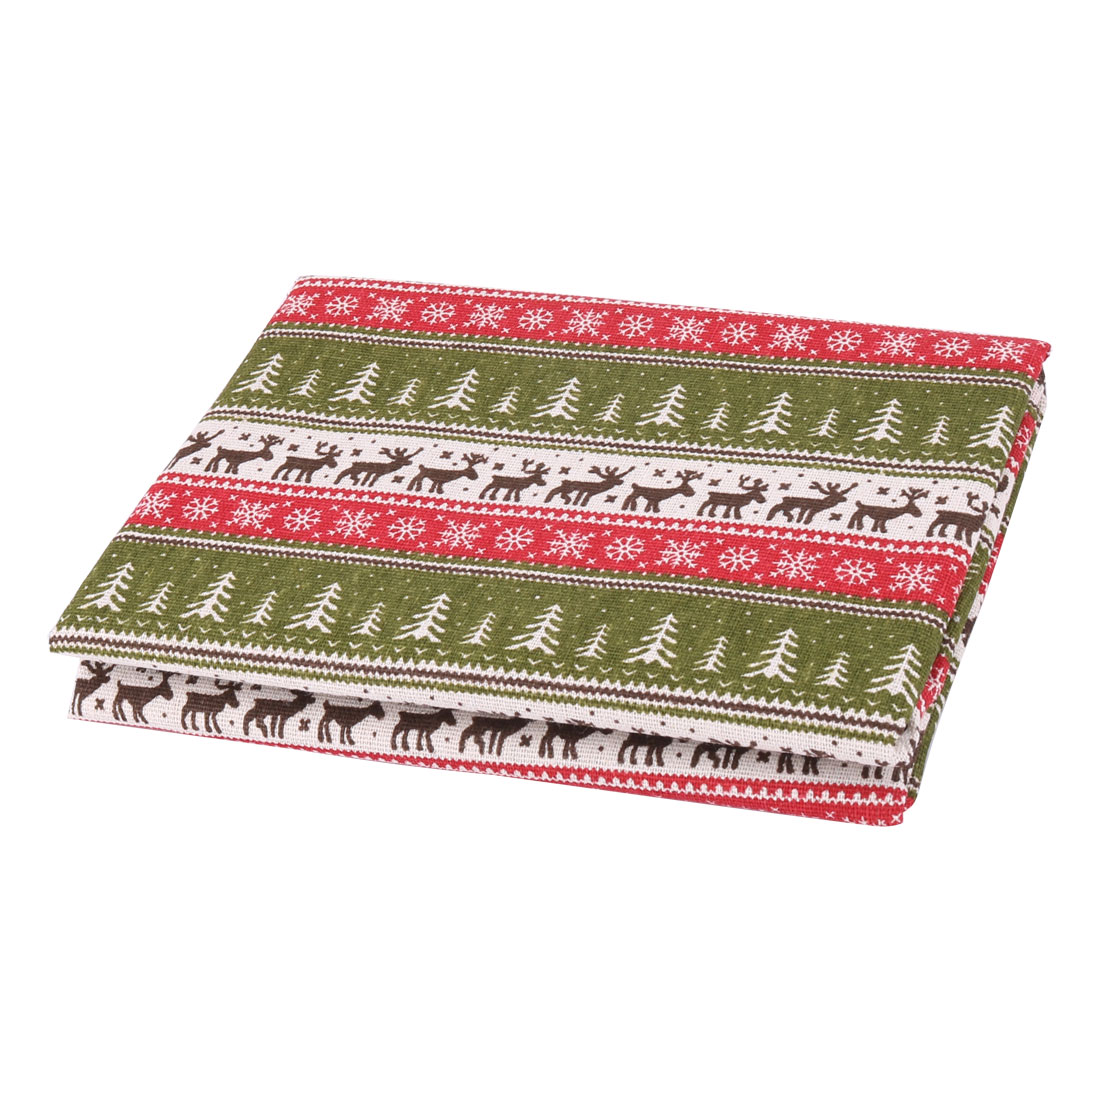 Unique BargainsLinen Fabric Deer Pattern Sofa Table Cover Handbag Making Art Craft DIY Cloth